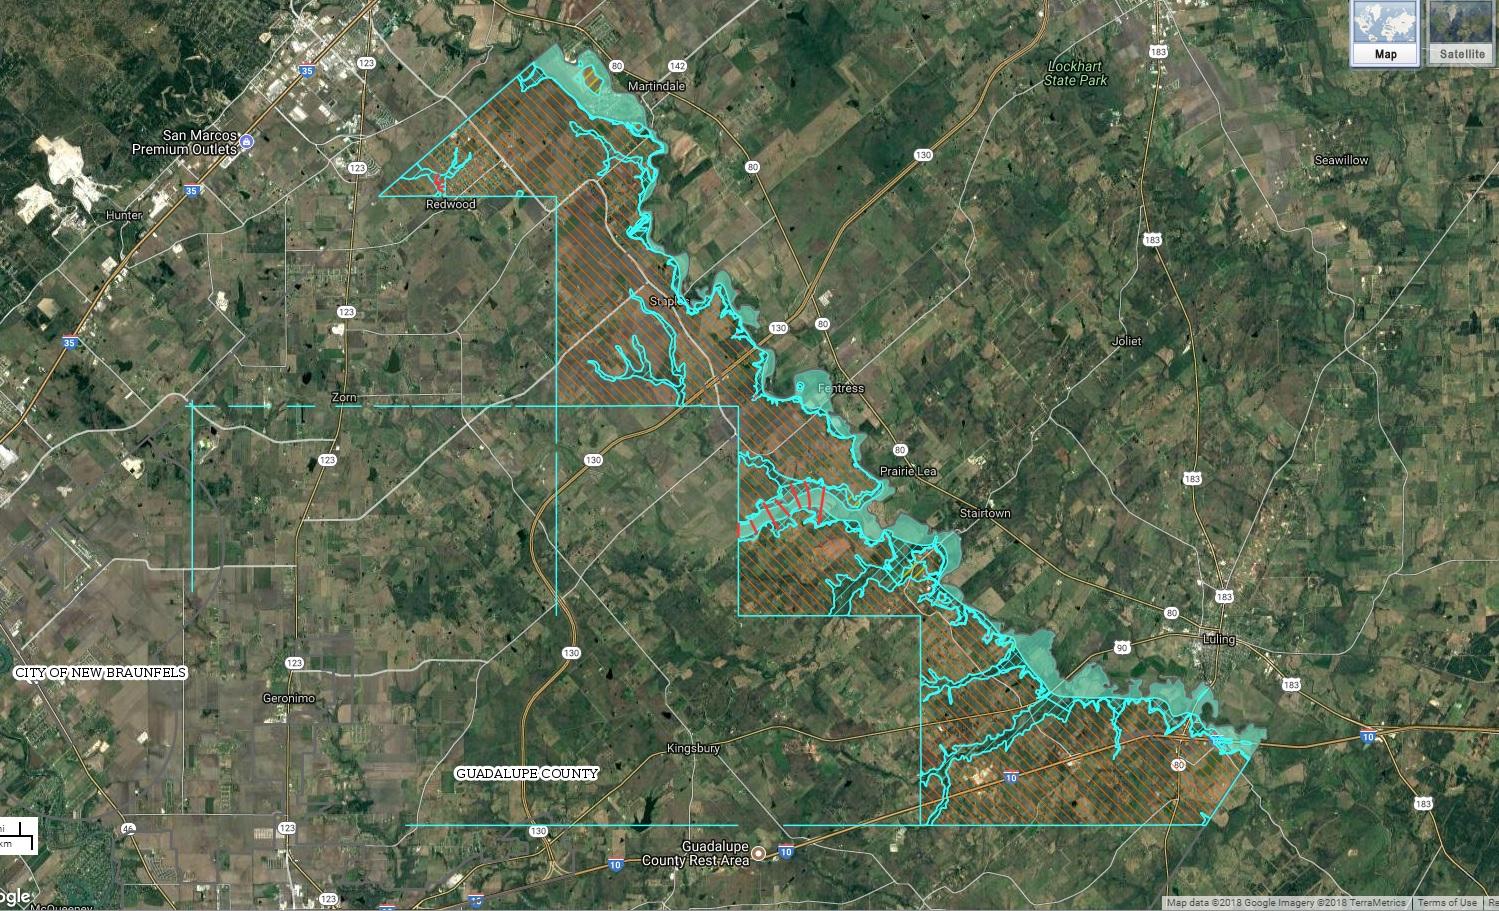 New Fema Flood Maps Show Hazardous Areas In Counties